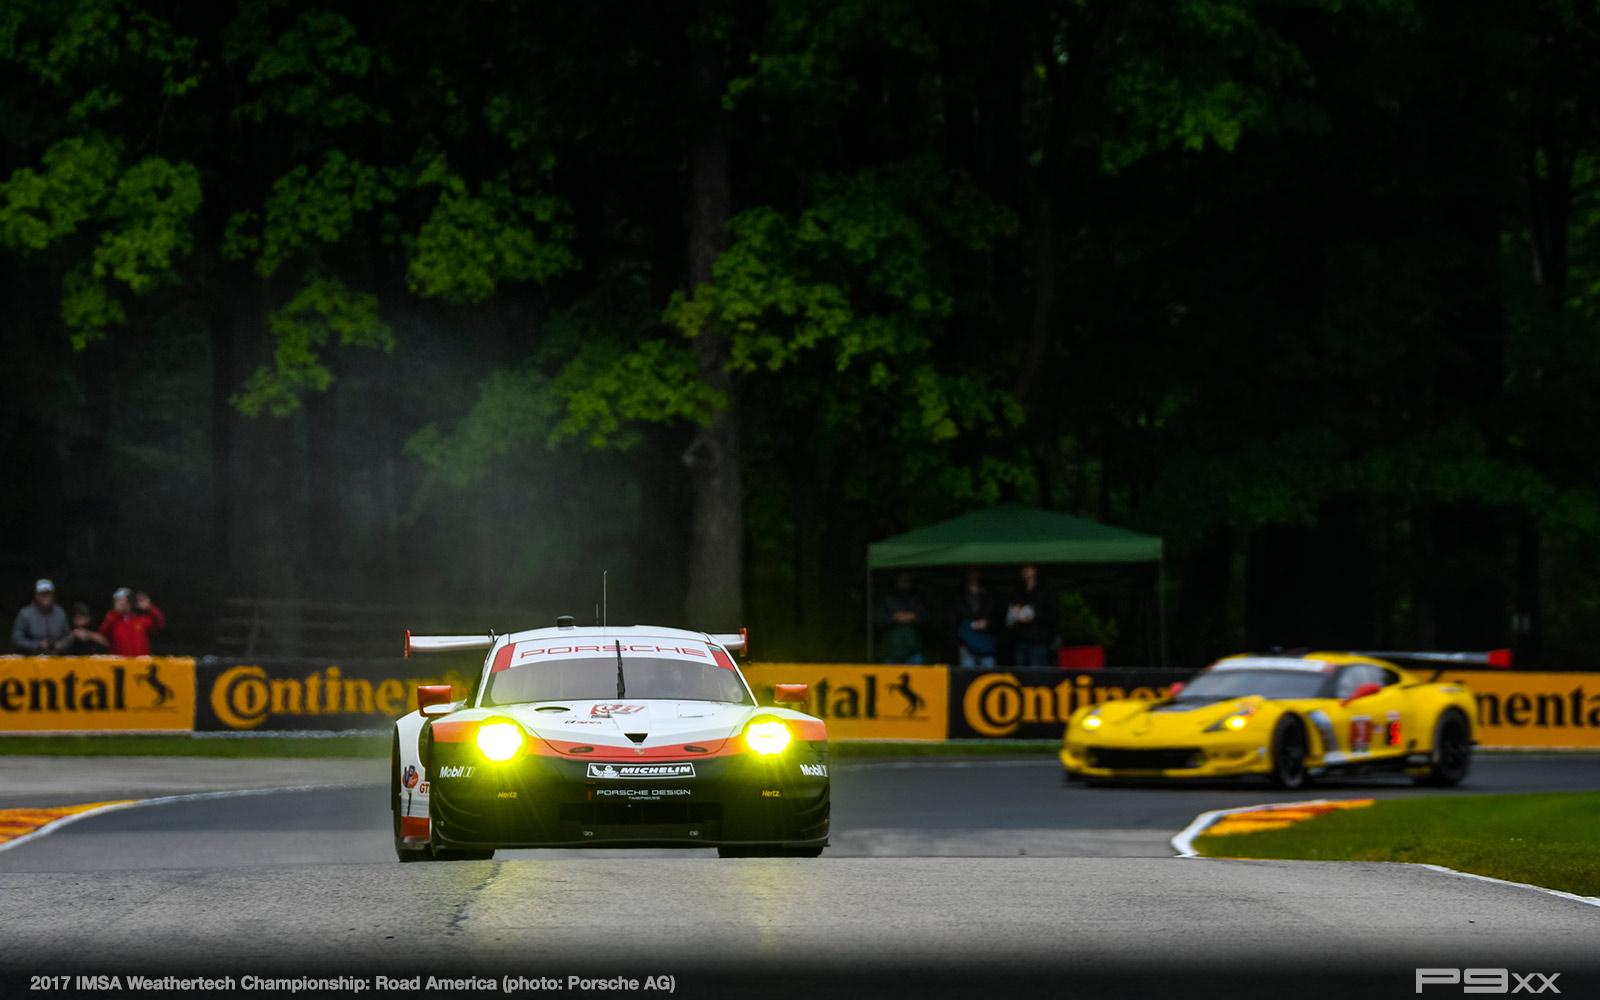 2017-IMSA-Weathertech-Road-America-Porsche-297